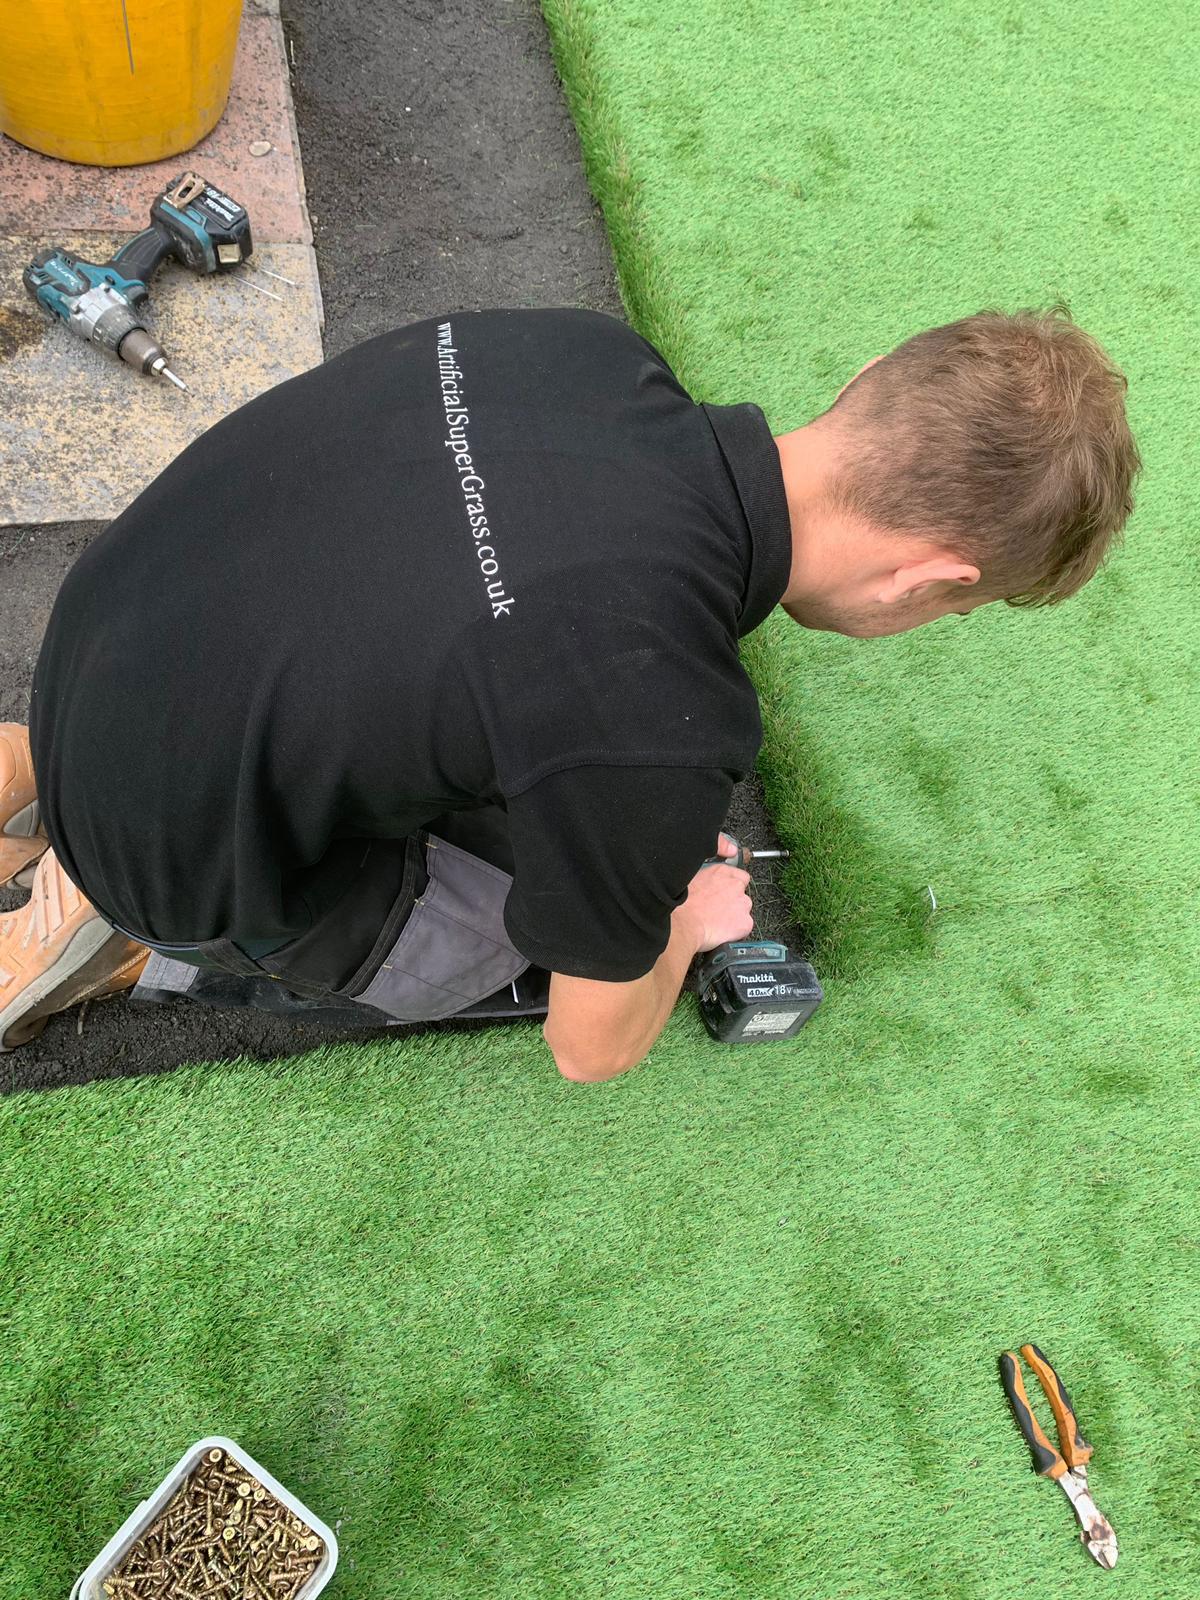 Fake Grass For Dogs Barton Upon Humber Artificial Super Grass